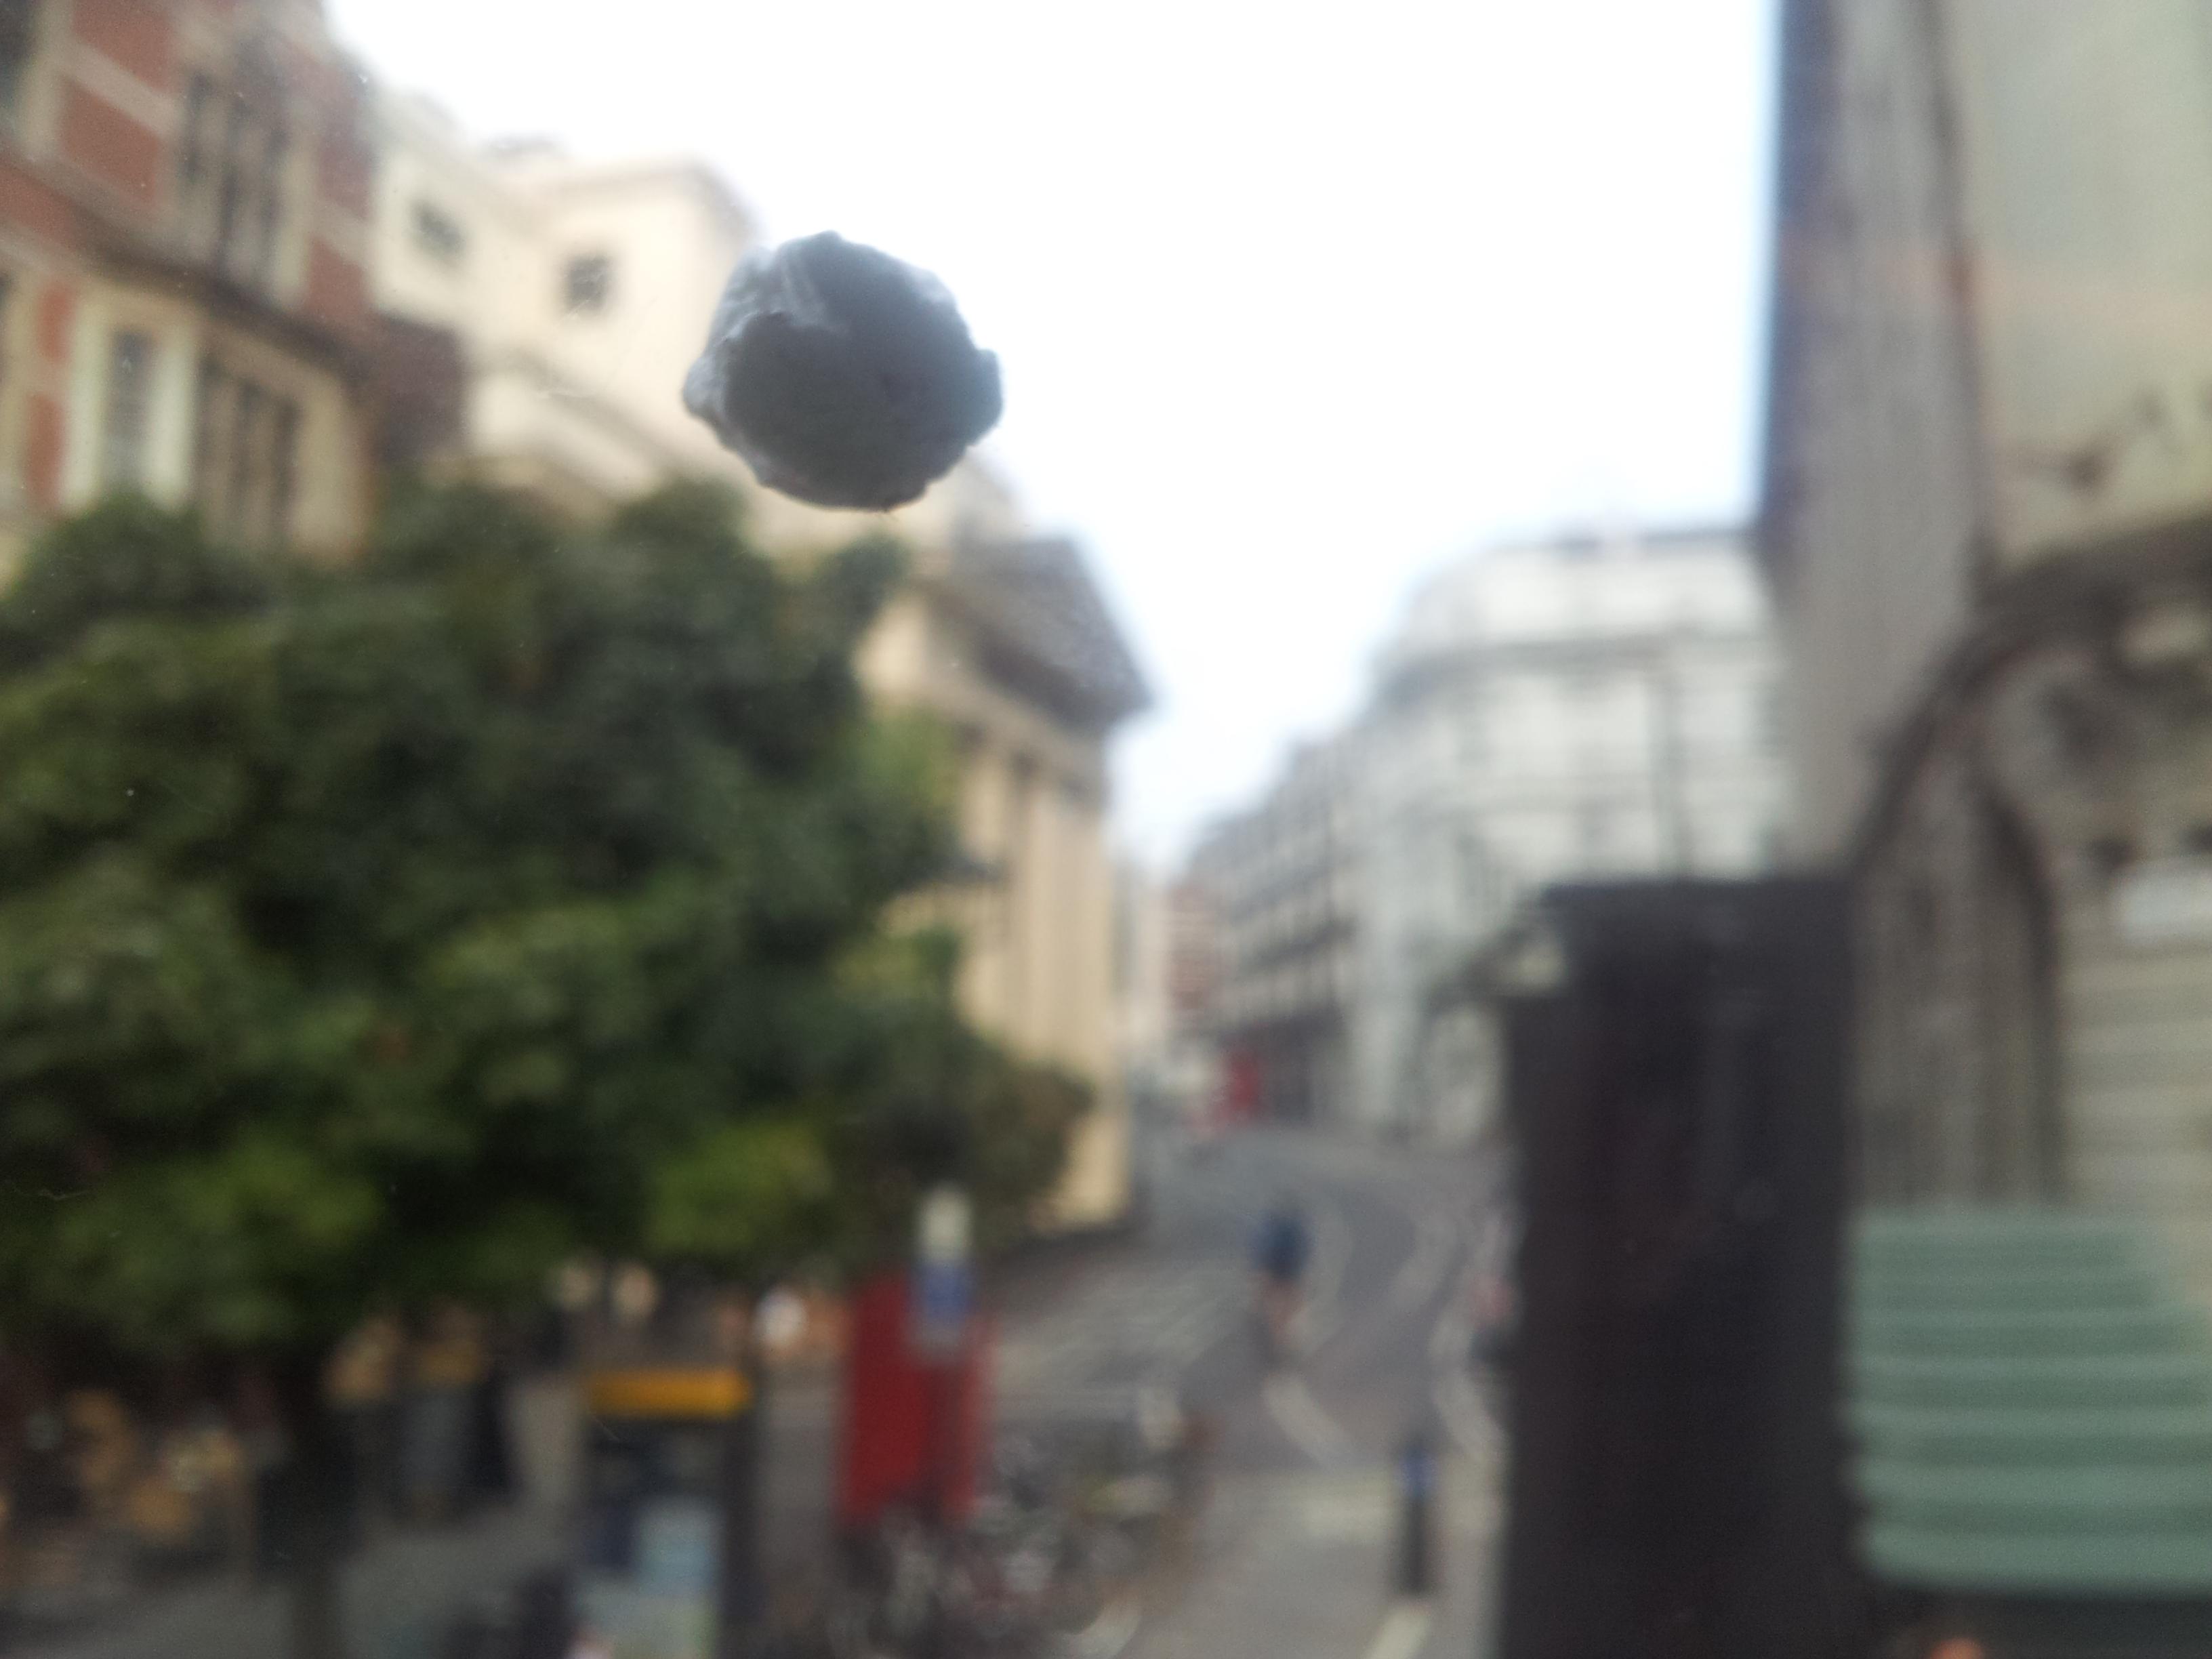 Chewing Gum (Upstairs Bus Window)